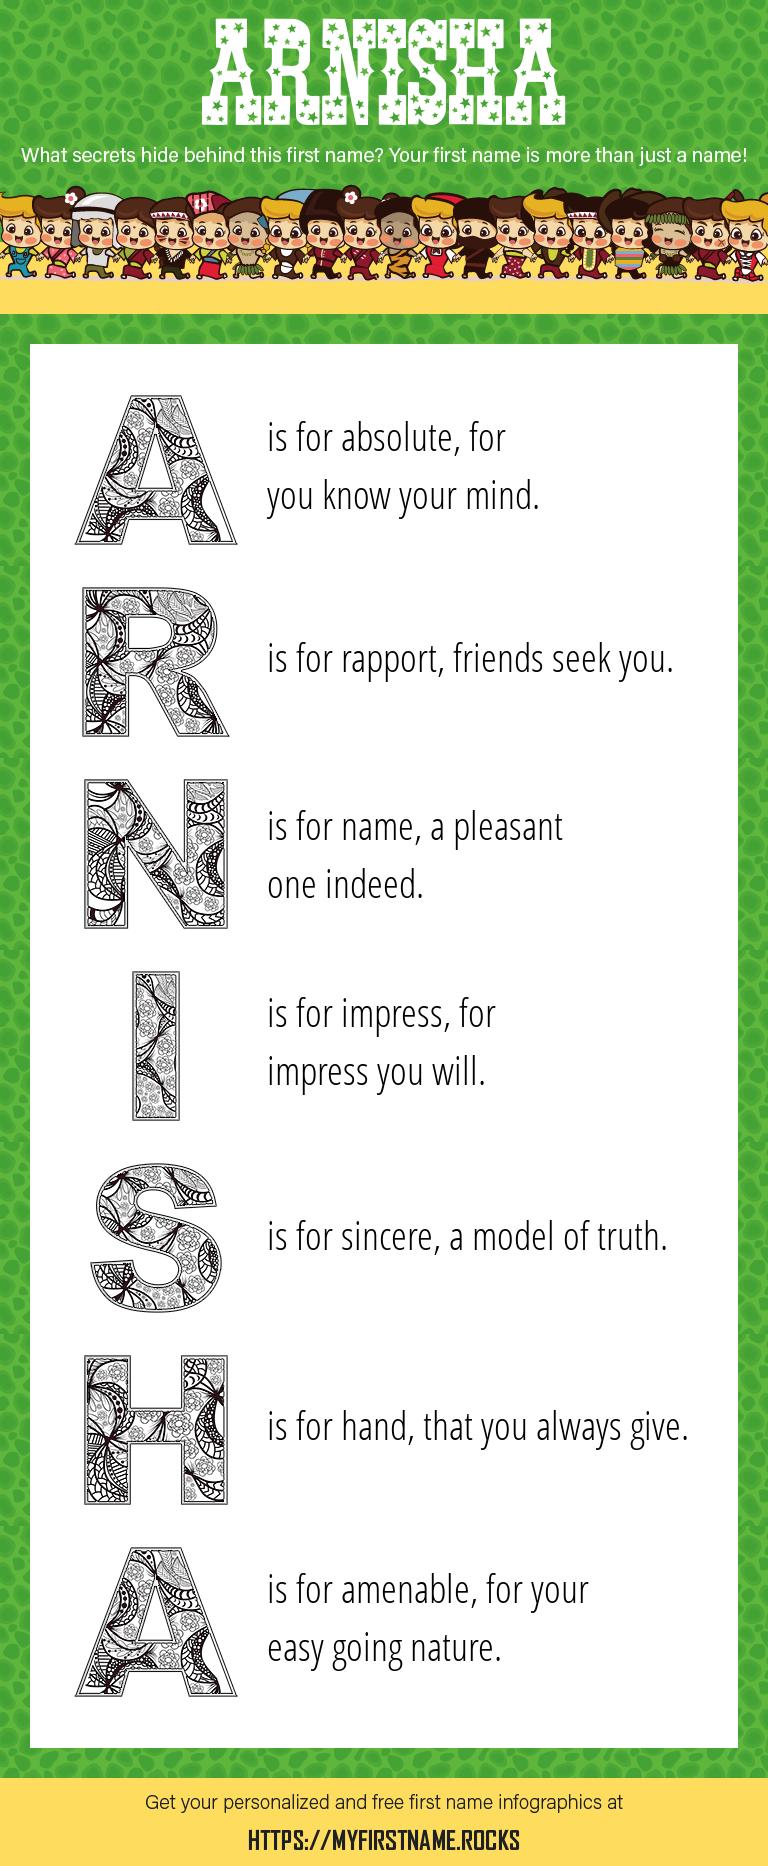 Arnisha Infographics